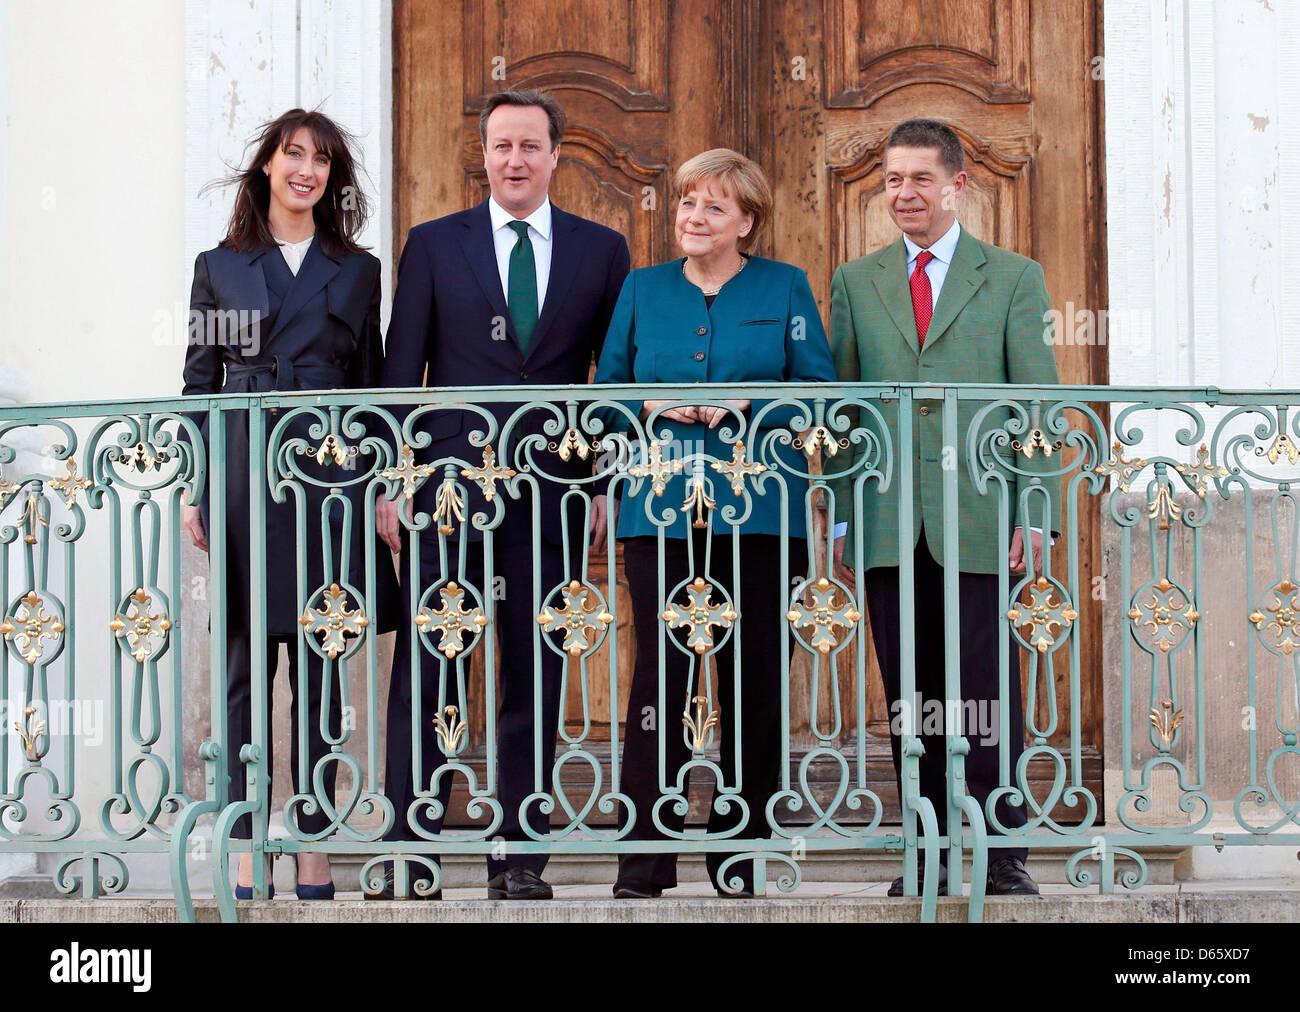 Schloss Meseberg, Germany. April 12, 2013. German Chancellor Angela Merkel and her husband Joachim Sauer (R) welcome - Stock Image